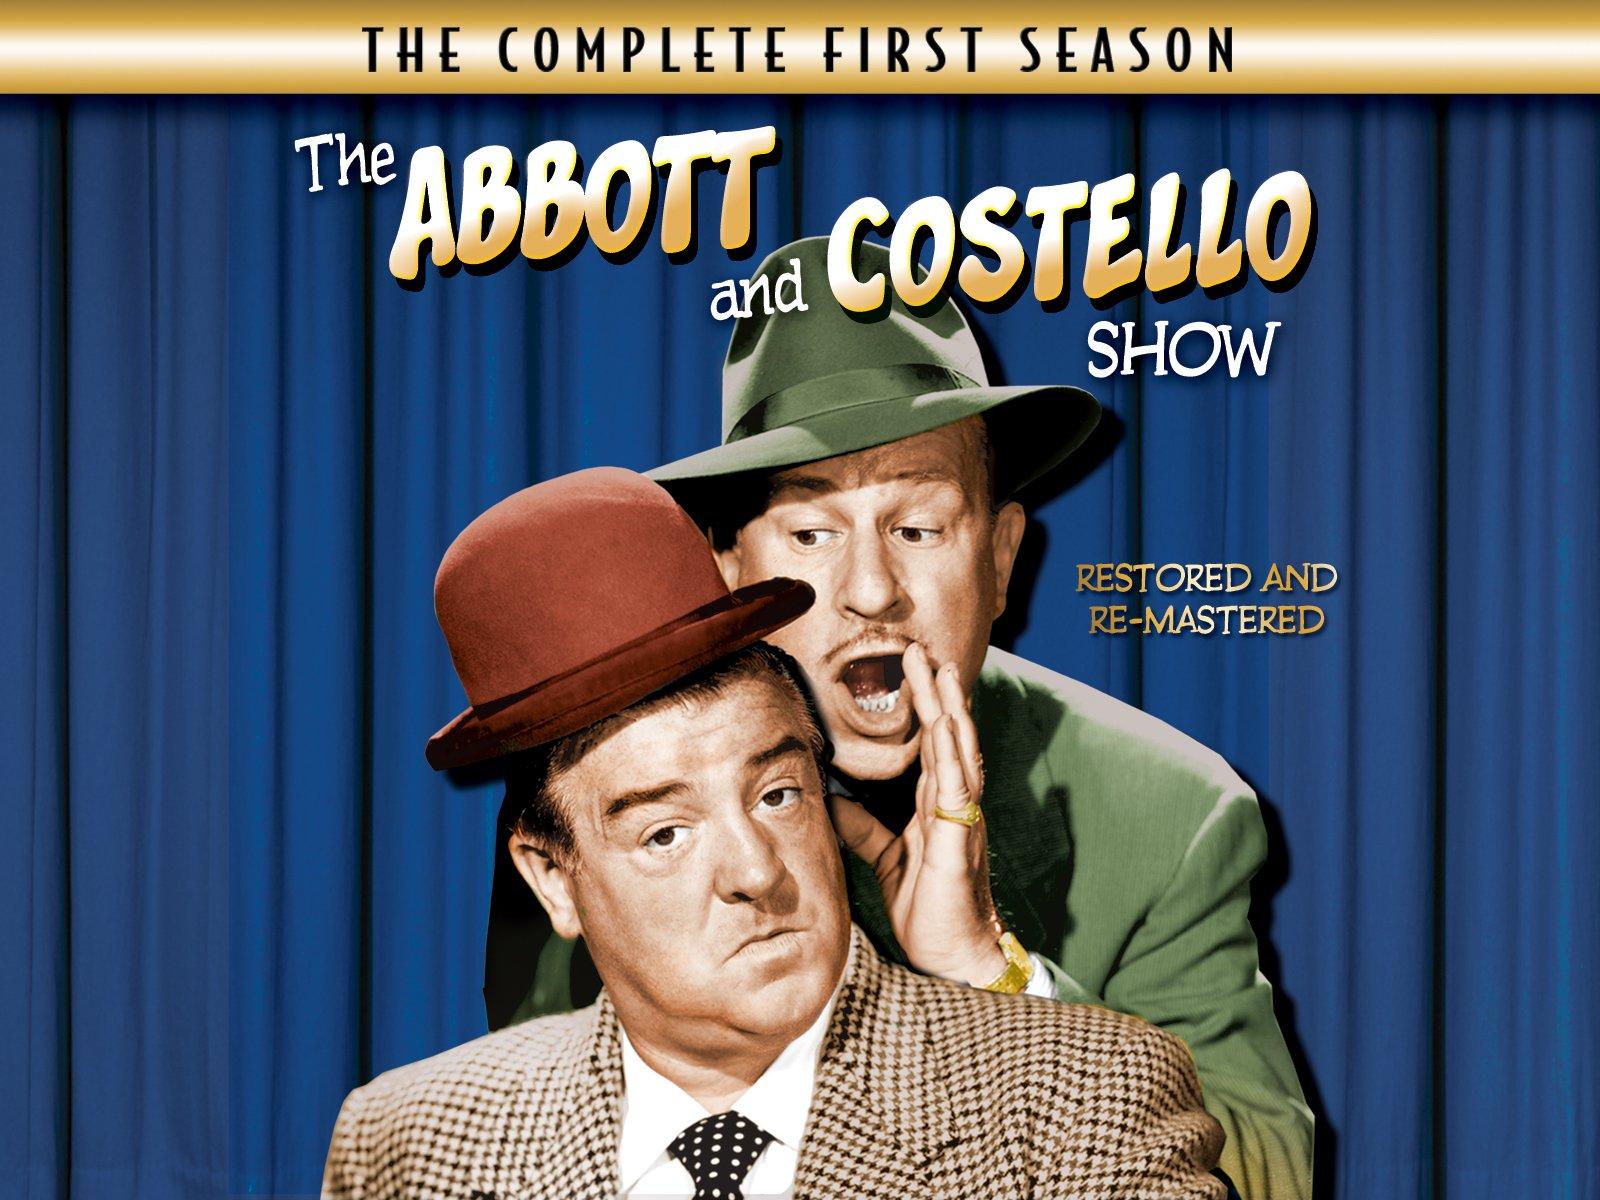 The Abbott and Costello Show season 1 (1953) starring Bud Abbott, Lou Costello, Hillary Brooke, Sid Fields